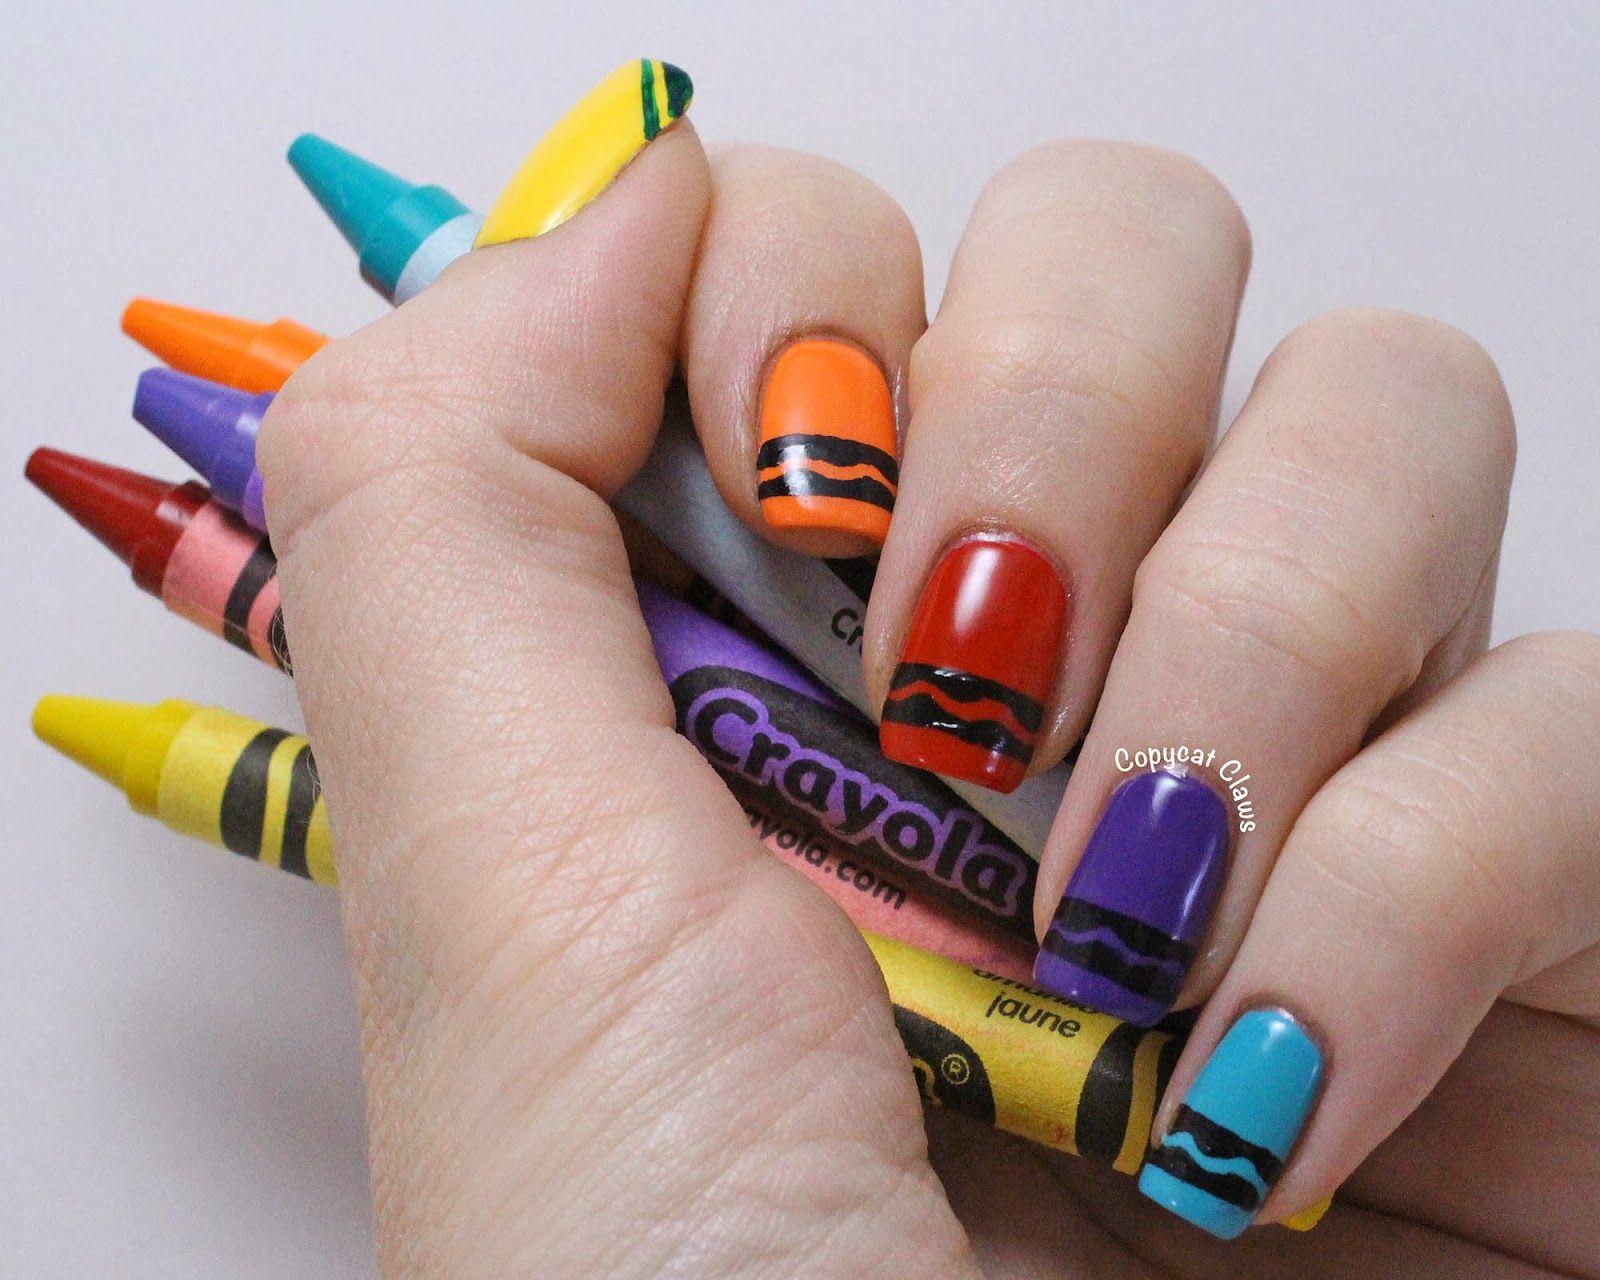 Copycat Claws: Crayon Nail Art | Nail Art | Pinterest | Copycat and ...